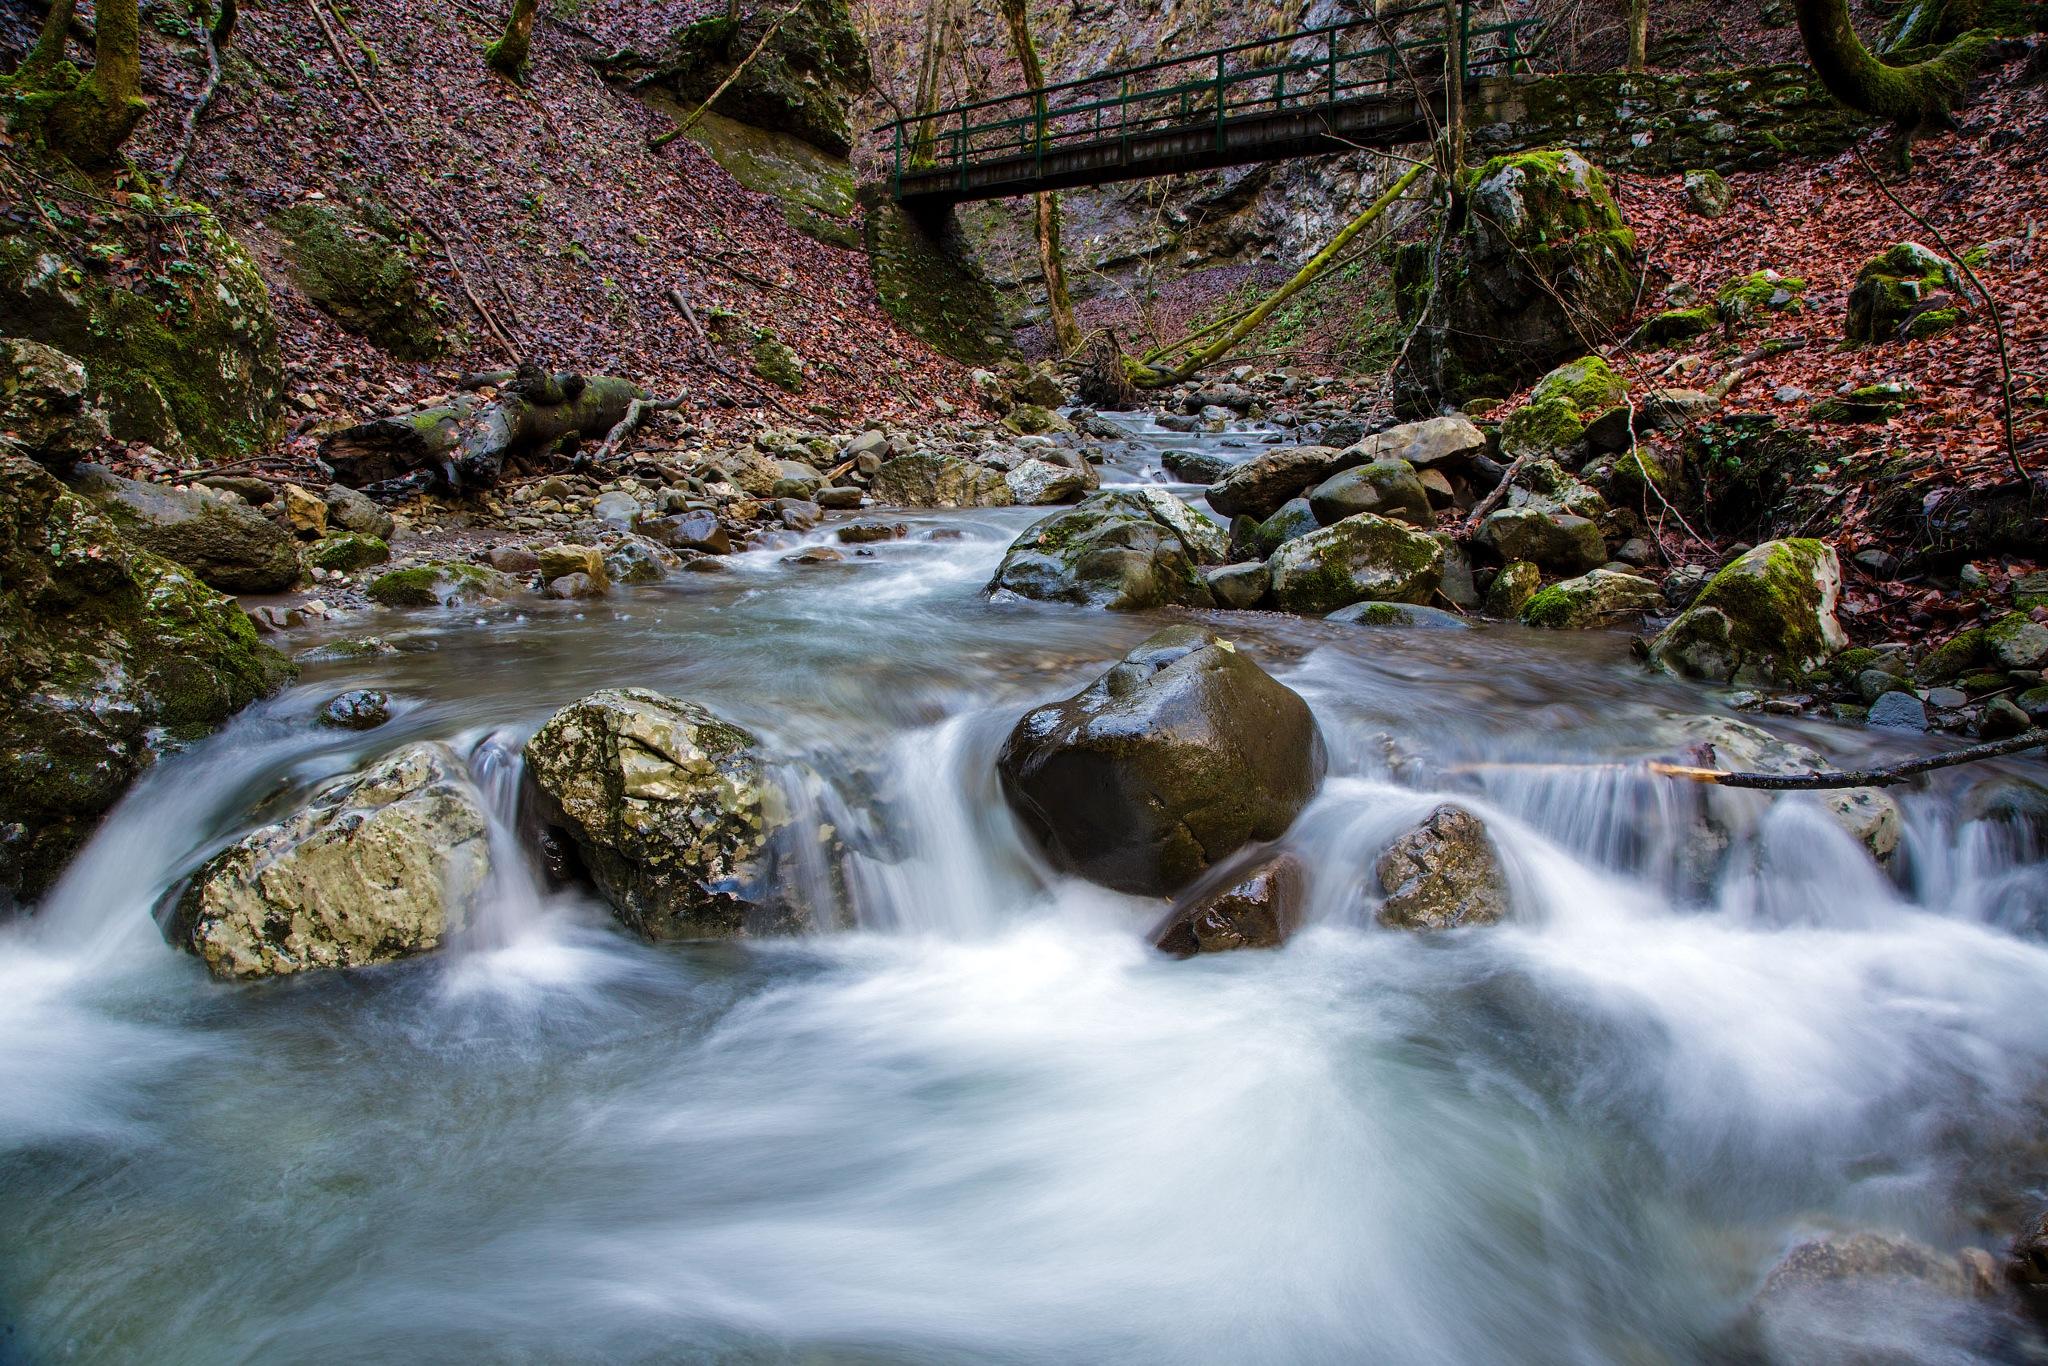 Jasle creek - Devil's pass canyon by stanislav.horacek2